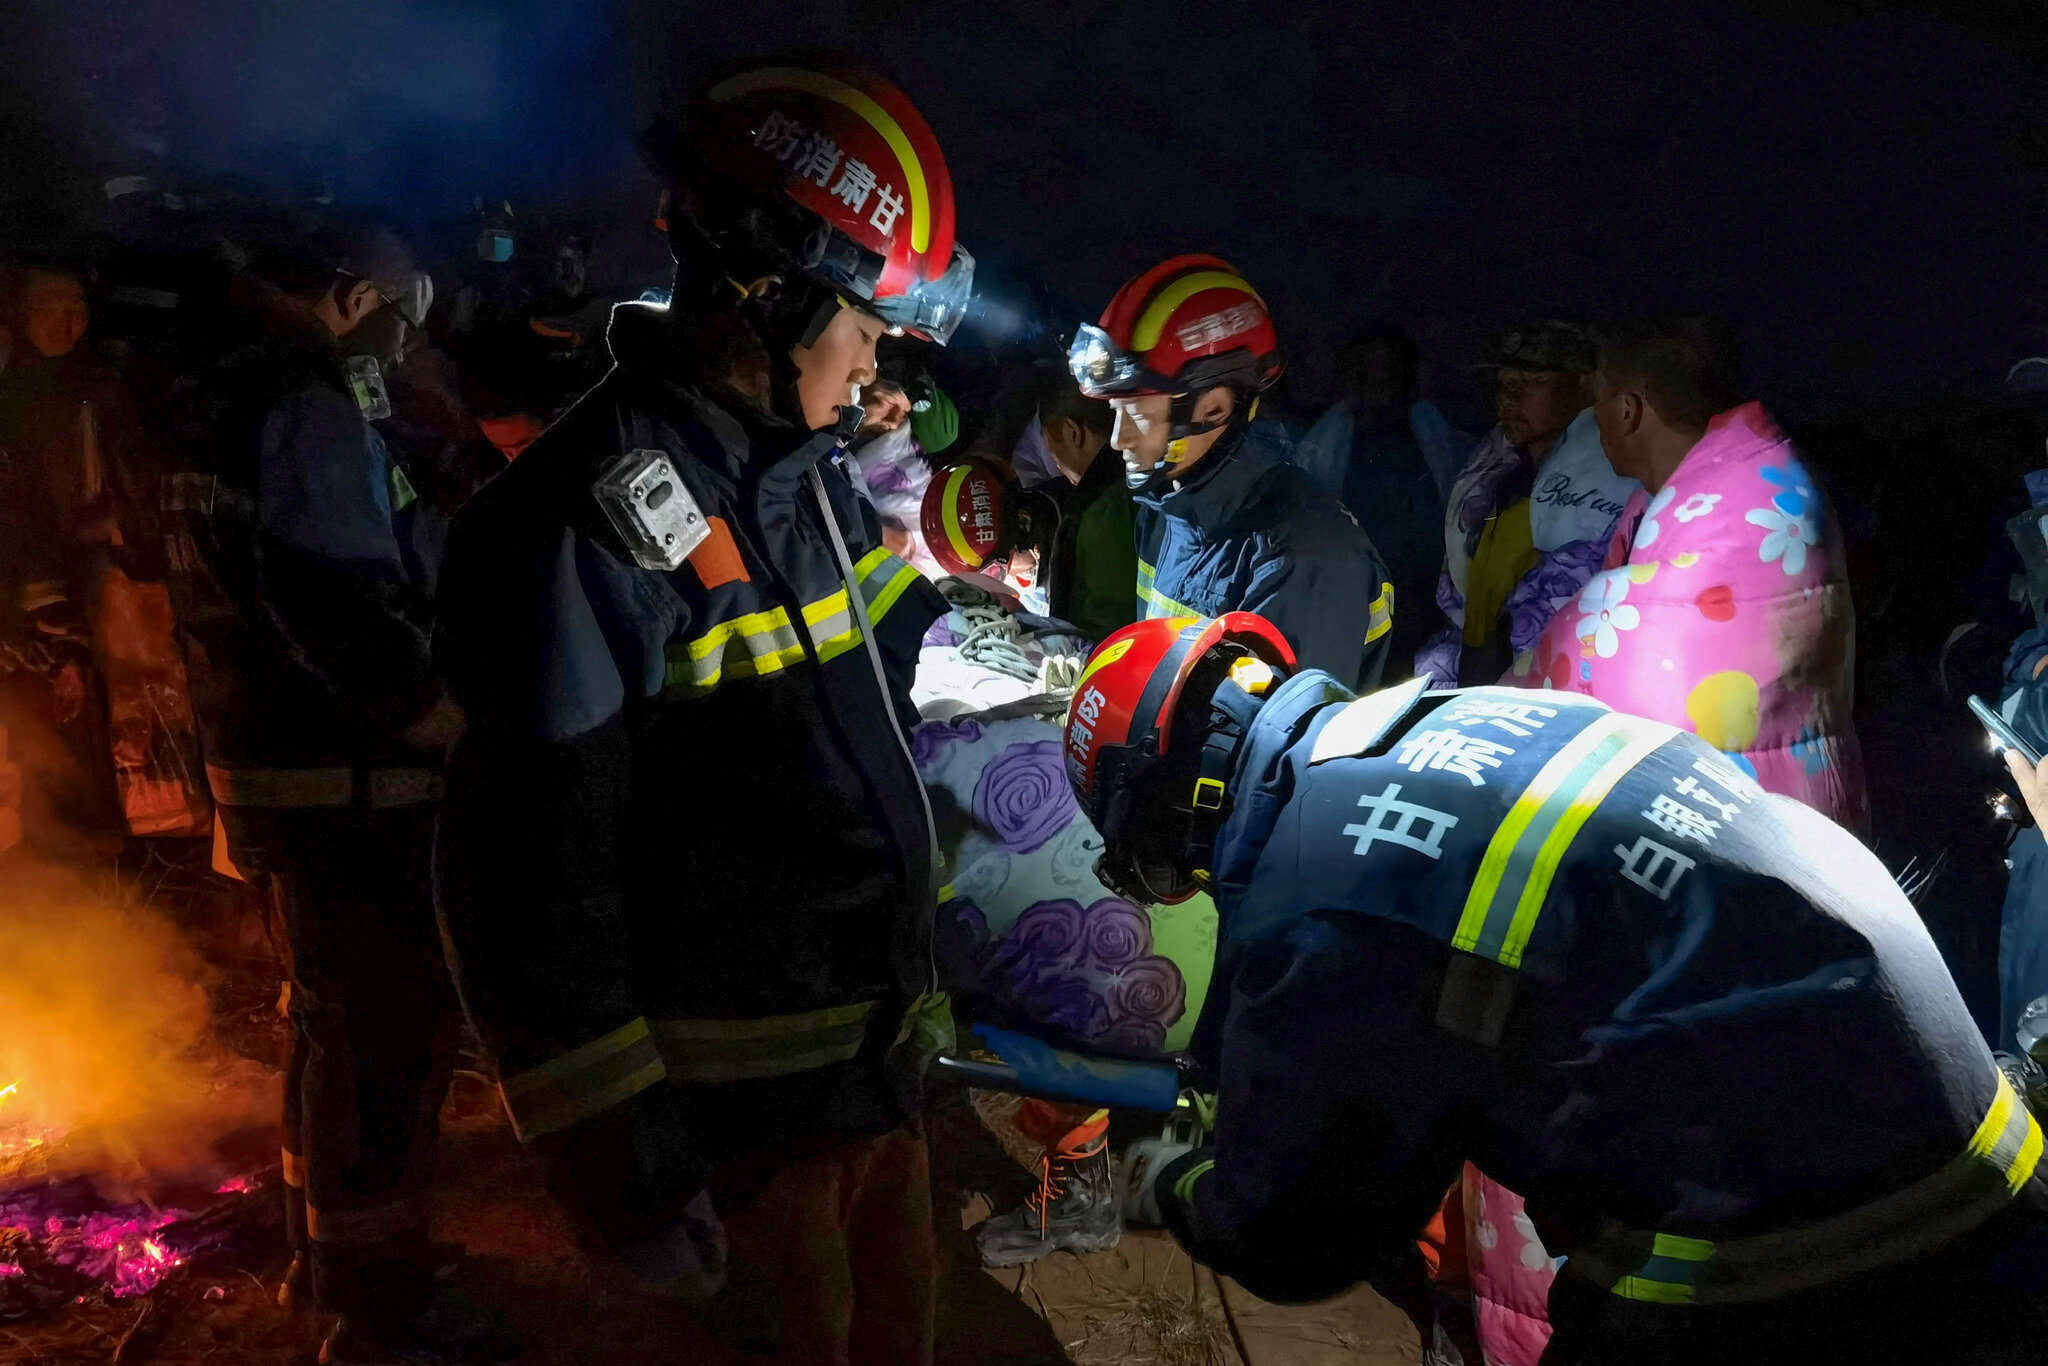 Petugas penyelamat membawa korban keluar dari tempat kejadian ke ruang gawat darurat rumah sakit.  Foto: AFP